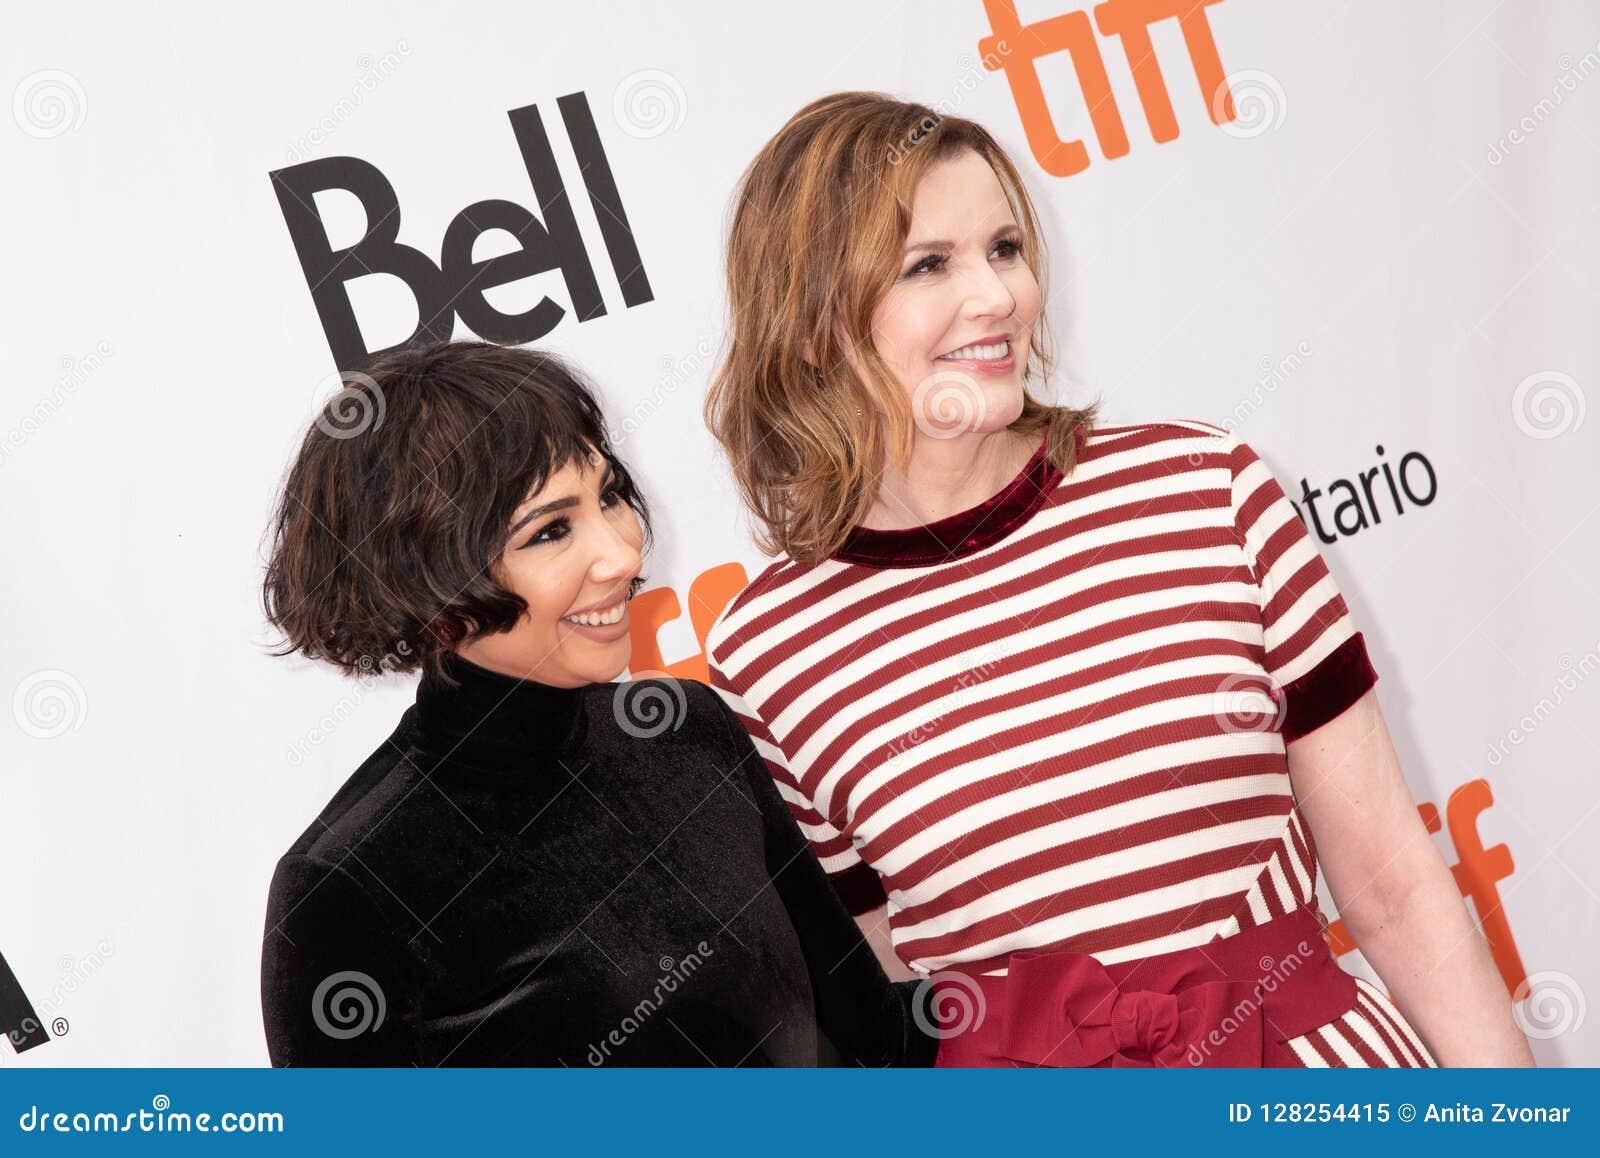 Geena Davis and Jackie Cruz is at premiere of `This Changes Everything` at TIFF2018